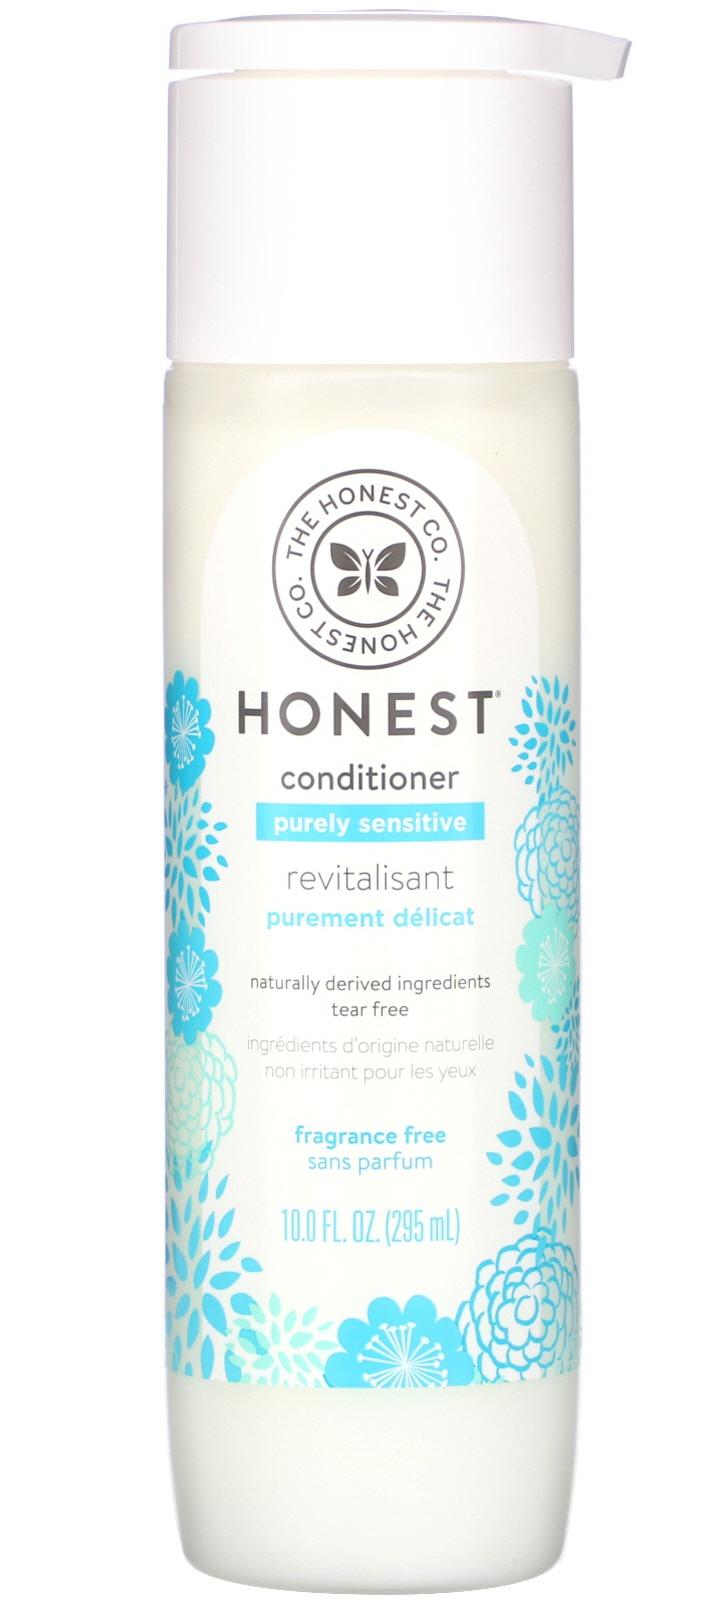 The Honest Company Purely Sensitive Conditioner